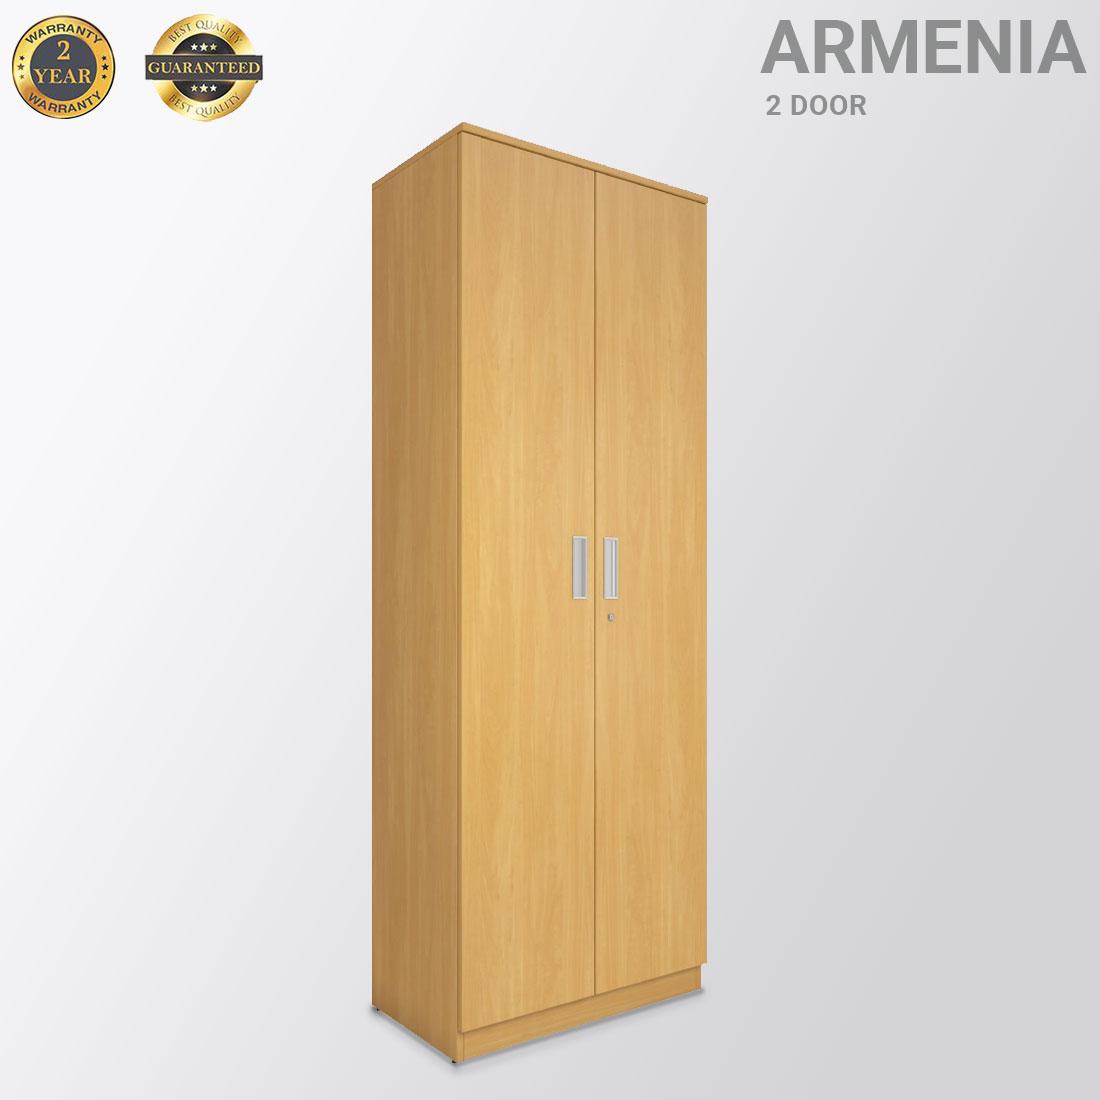 ARMENIA O 2 DOOR